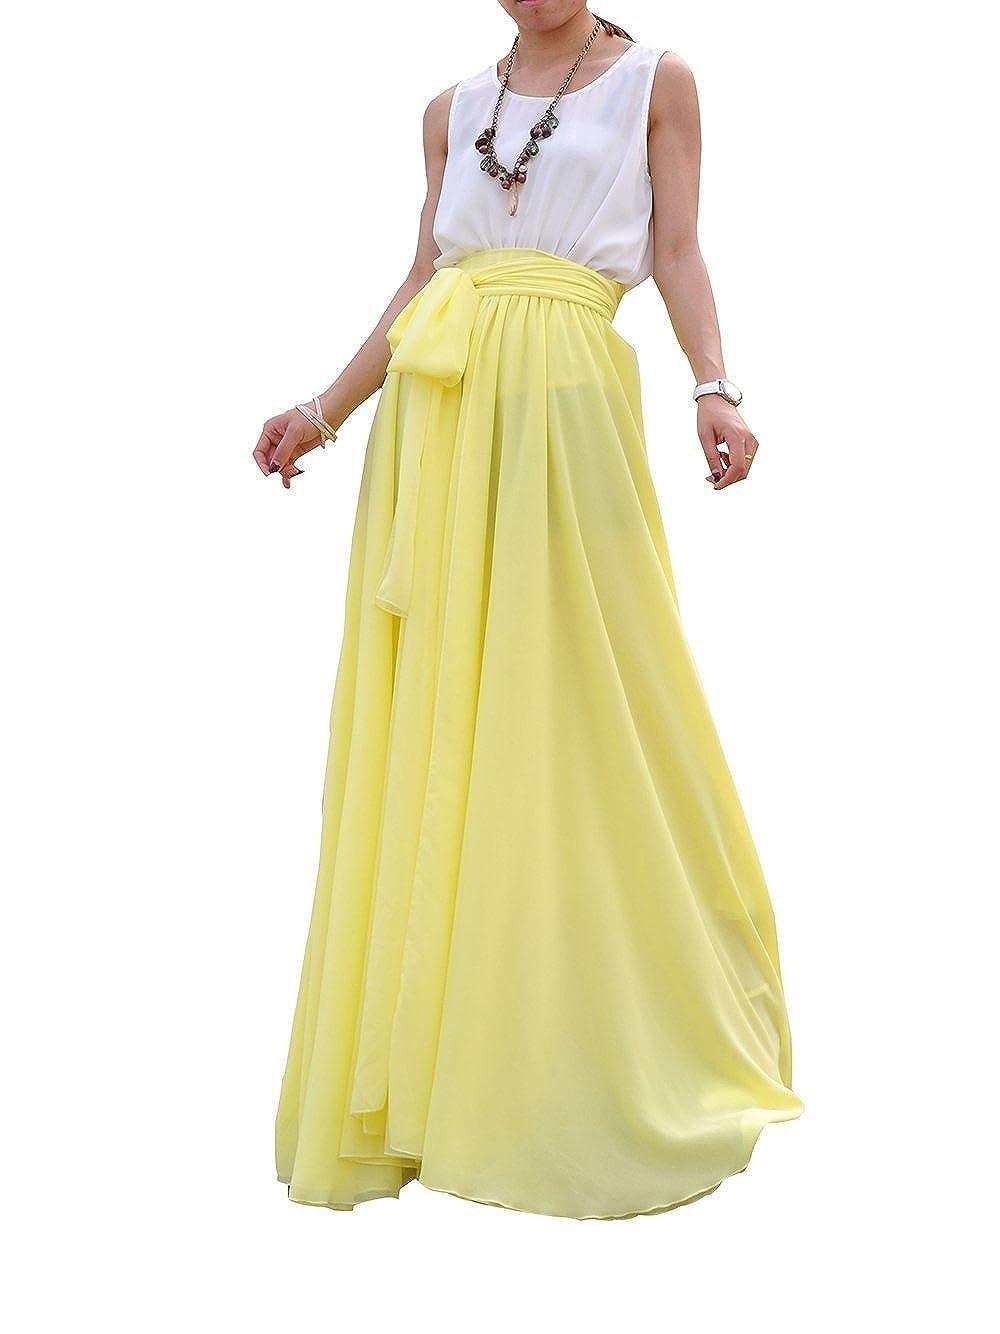 4ebb6fdcf0 Chiffon Maxi Skirt With Shorts Underneath